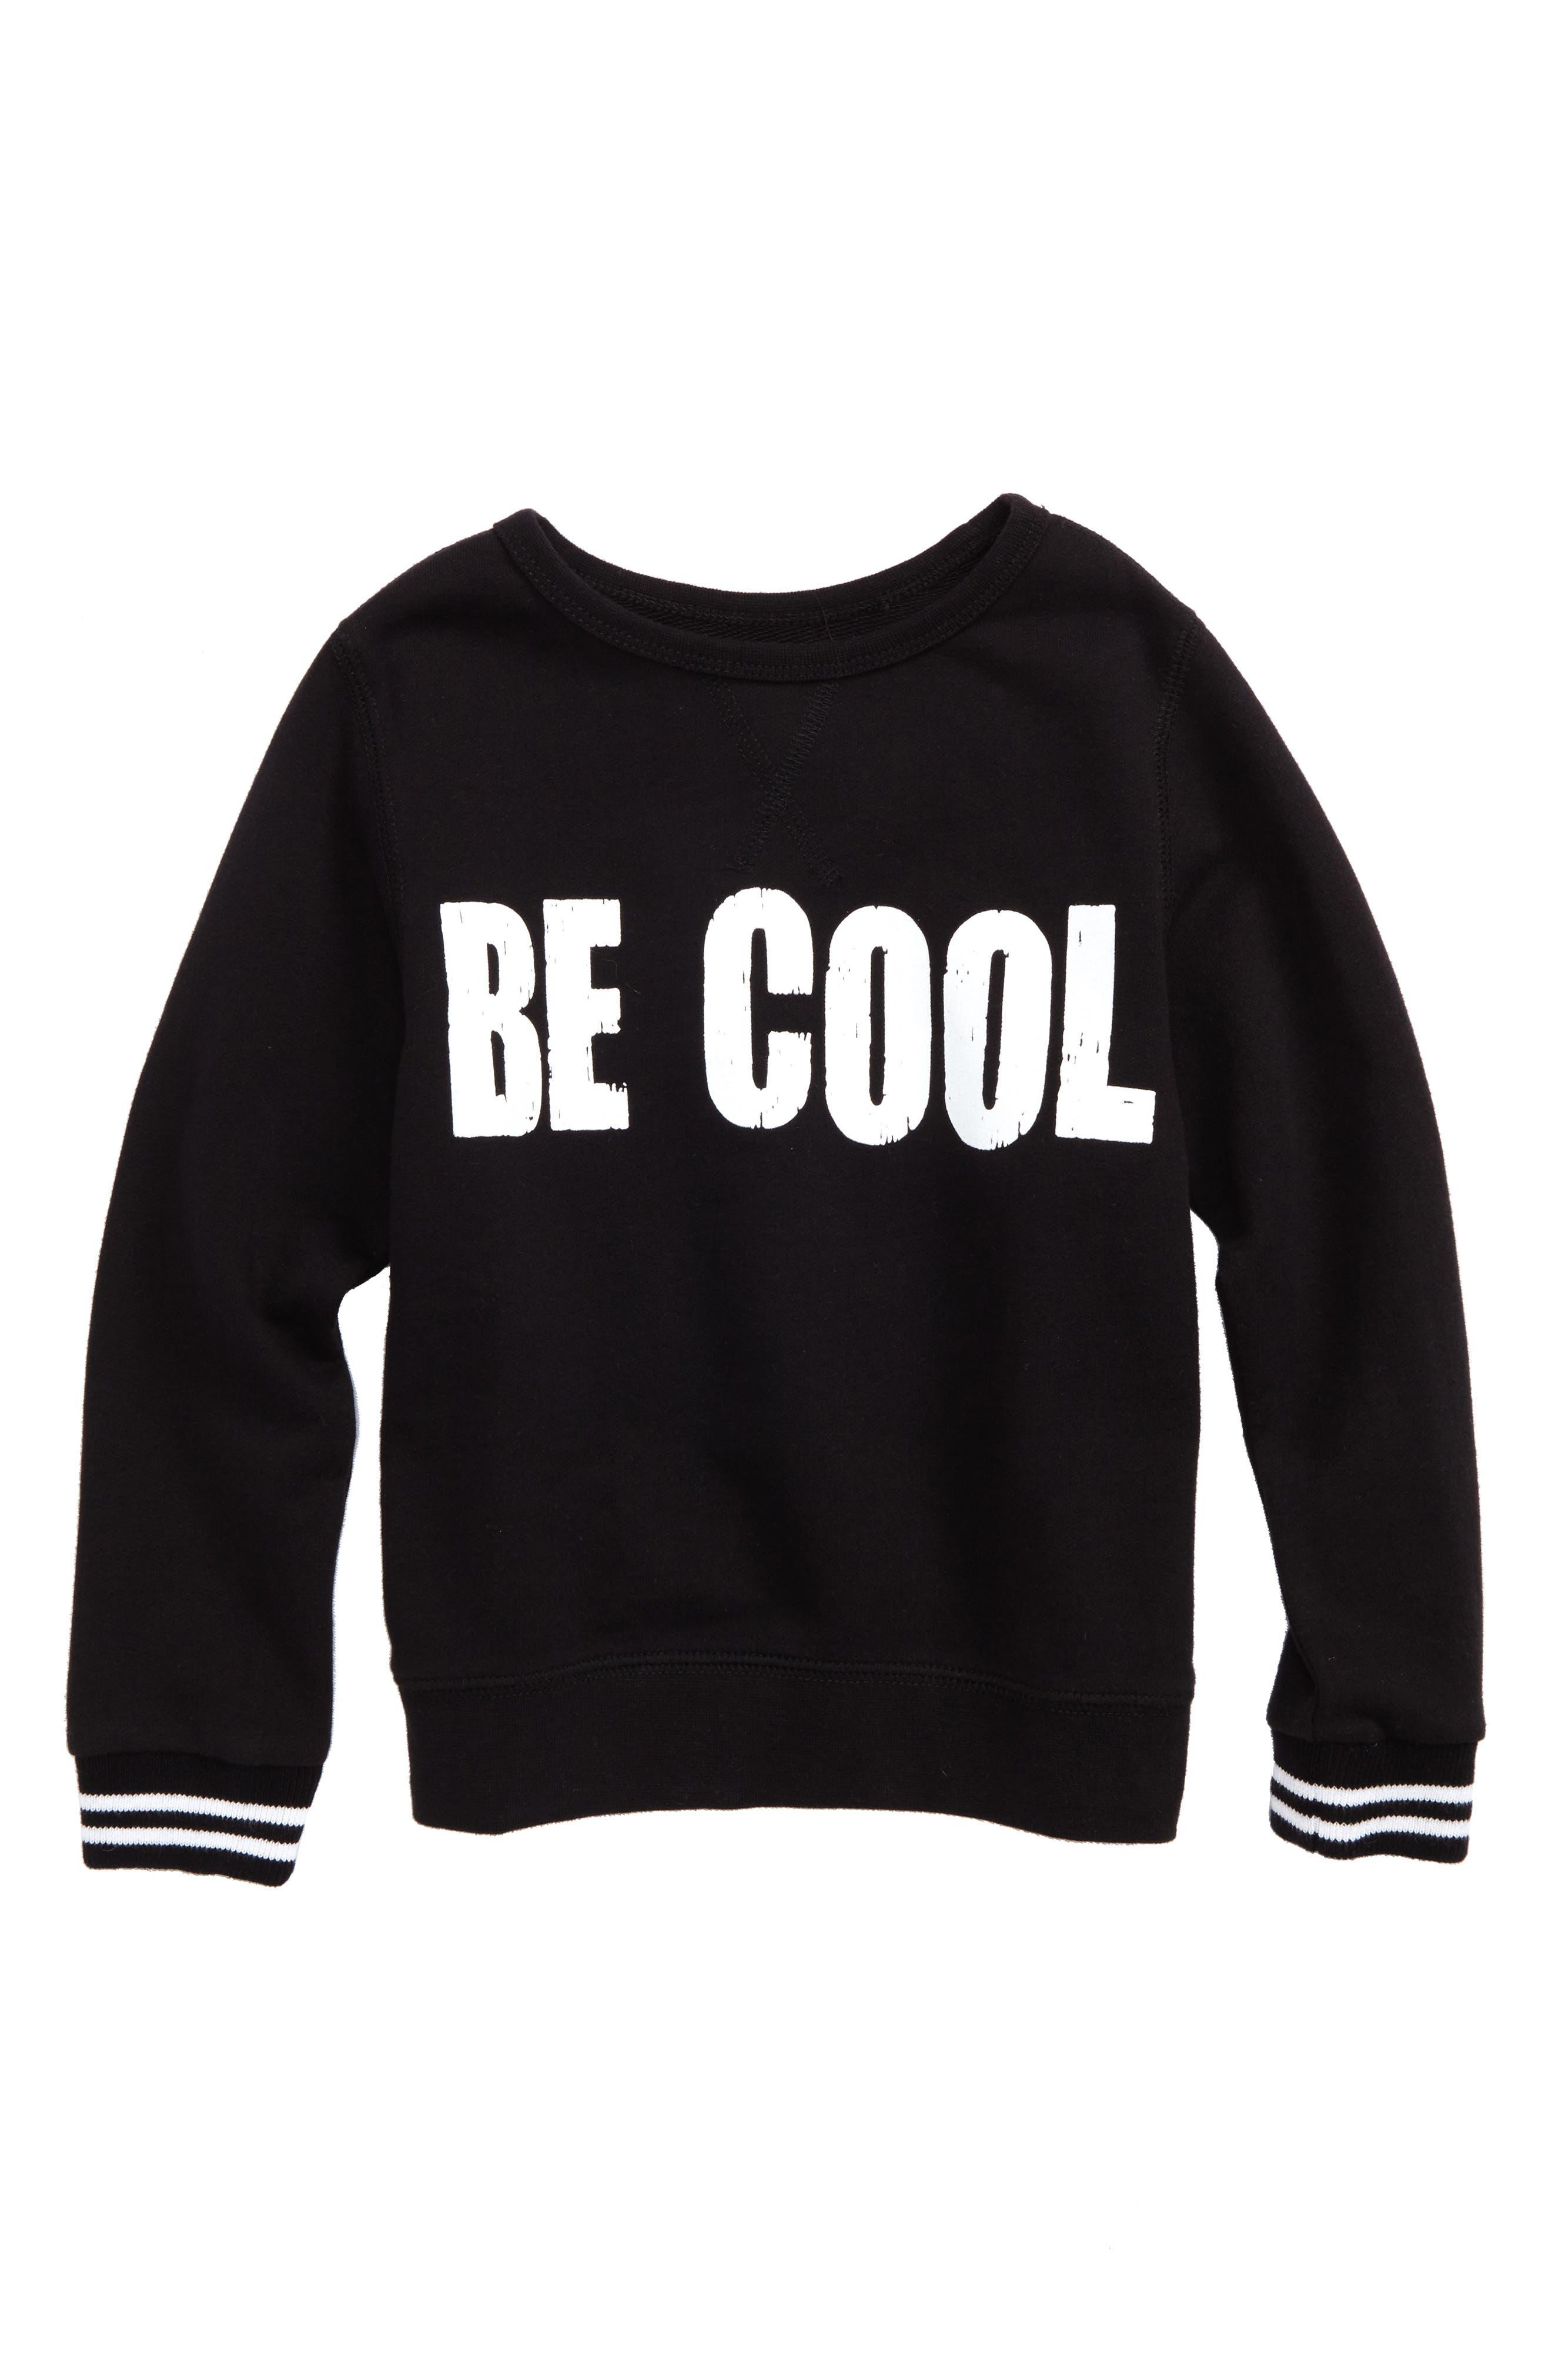 Peek Be Cool Graphic Sweatshirt (Toddler Boys, Little Boys & Big Boys)